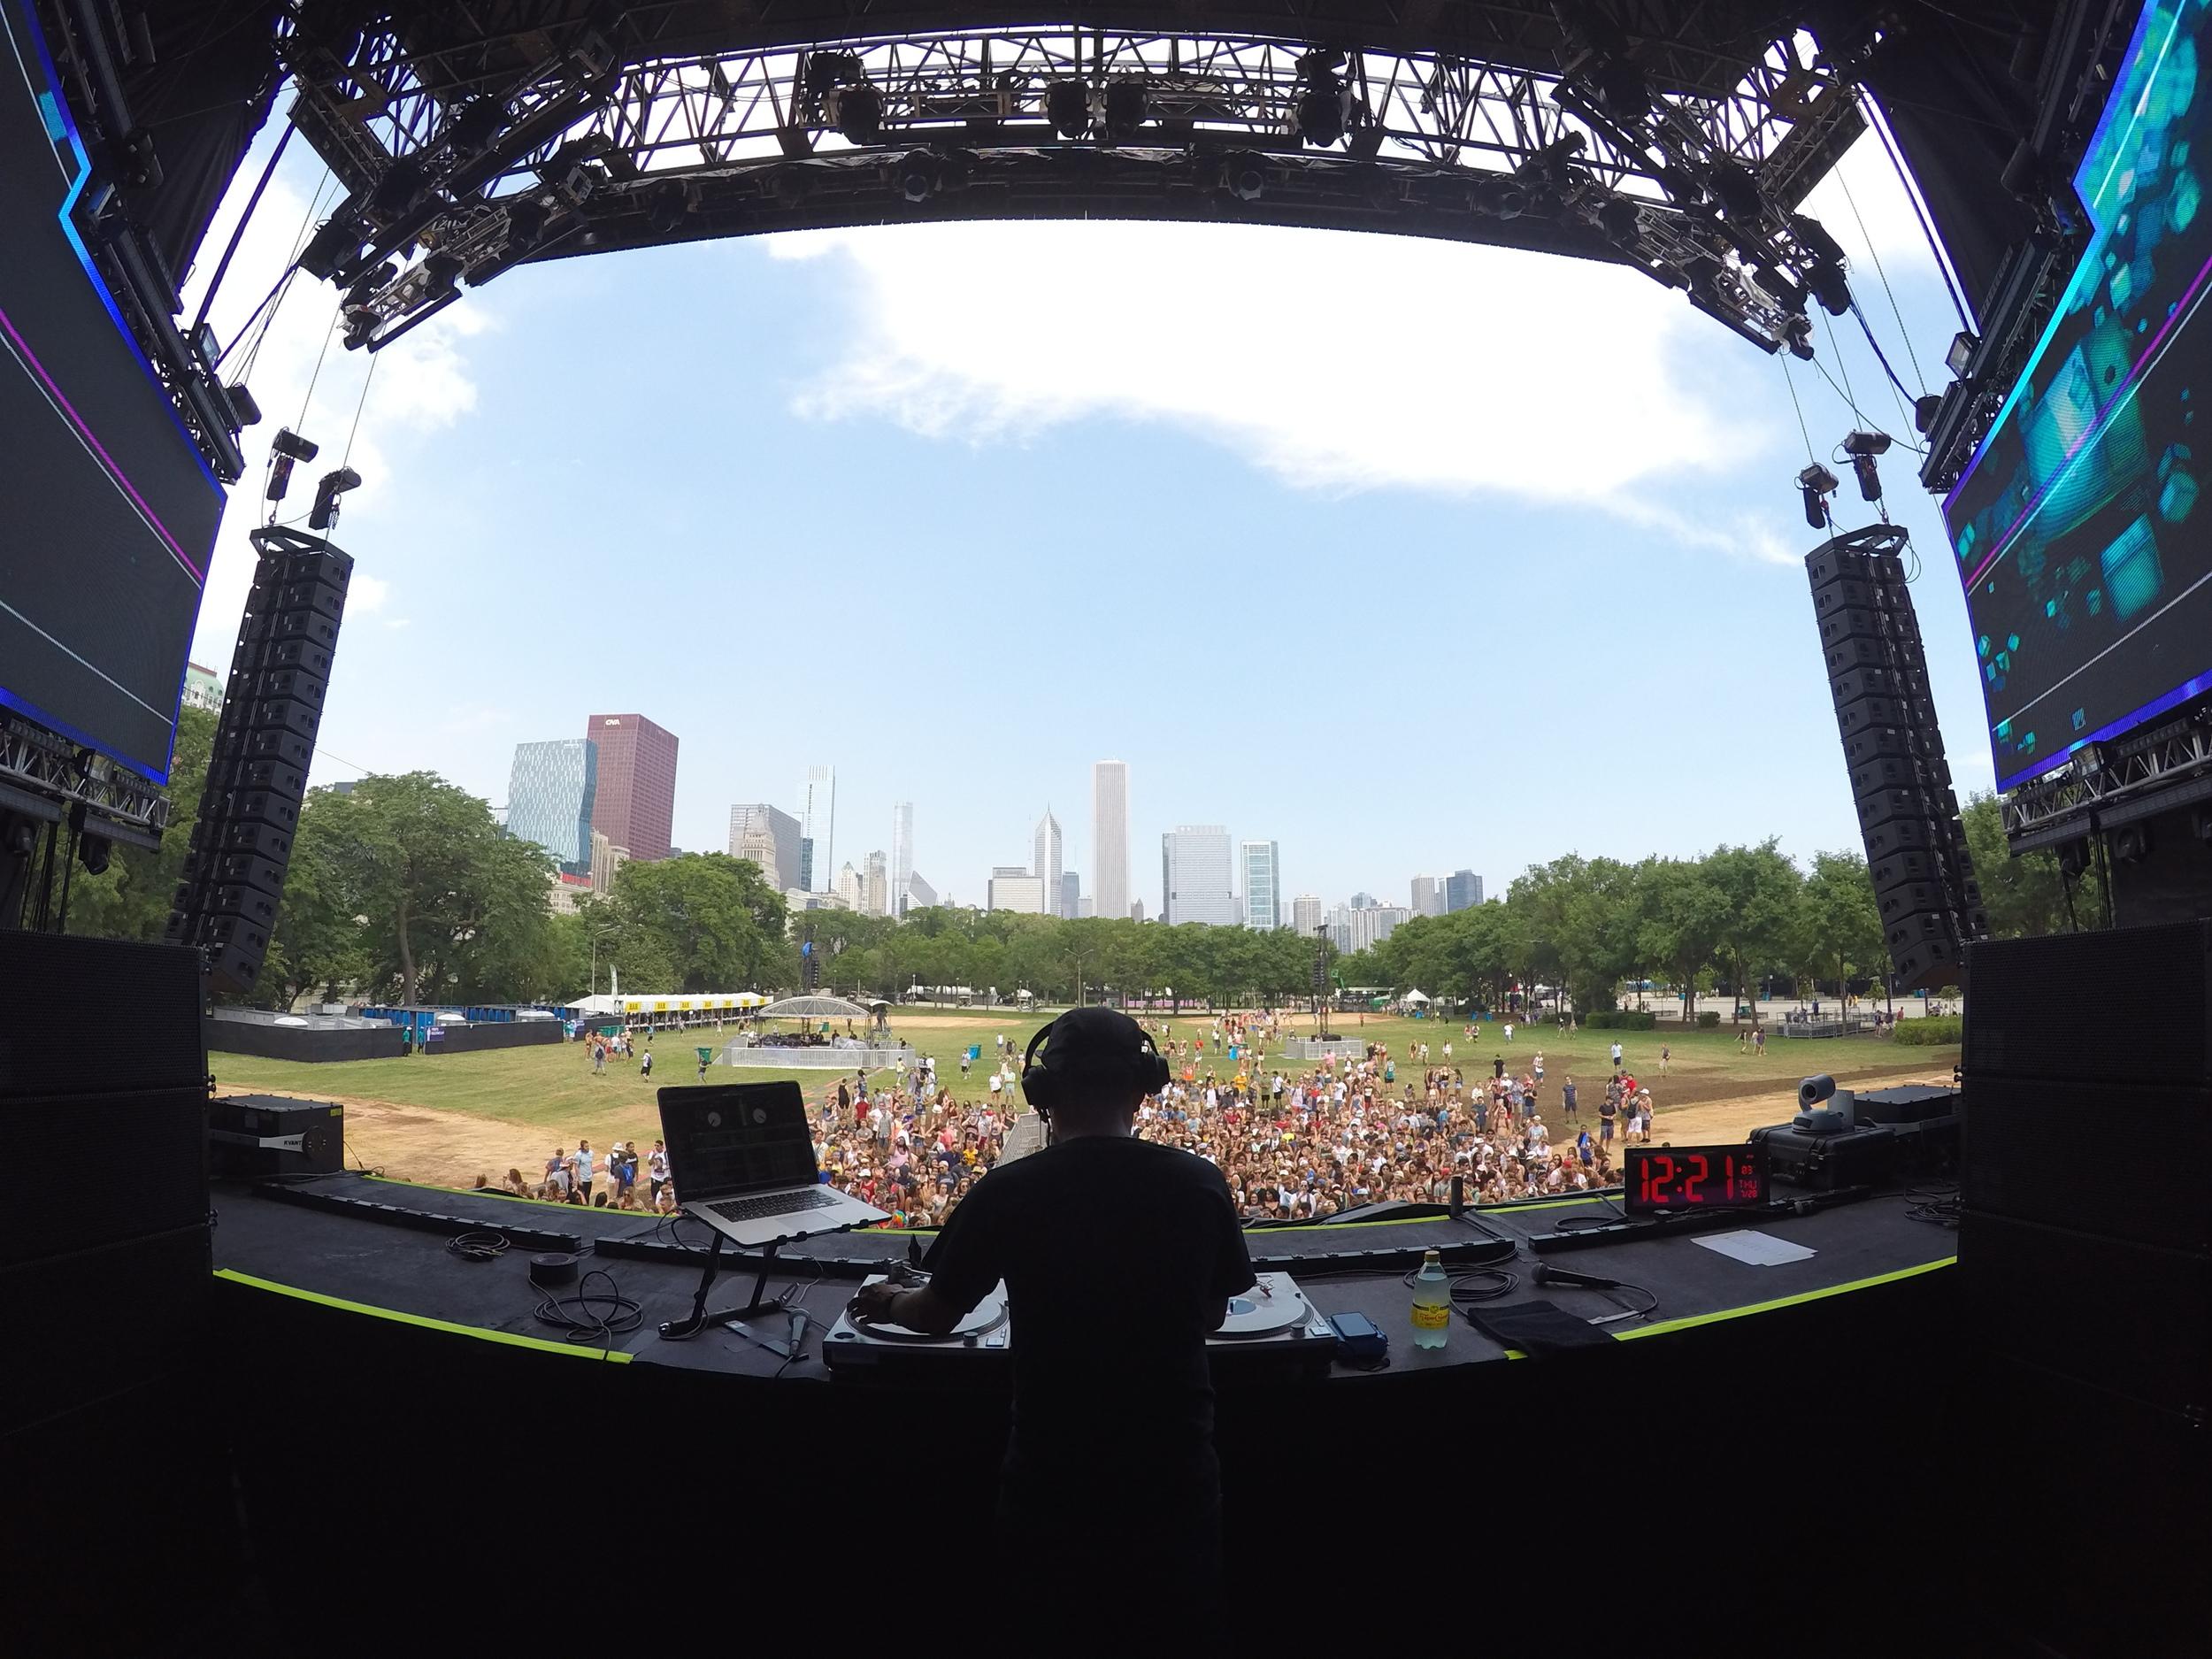 Lollapalooza 2016 - Chicago